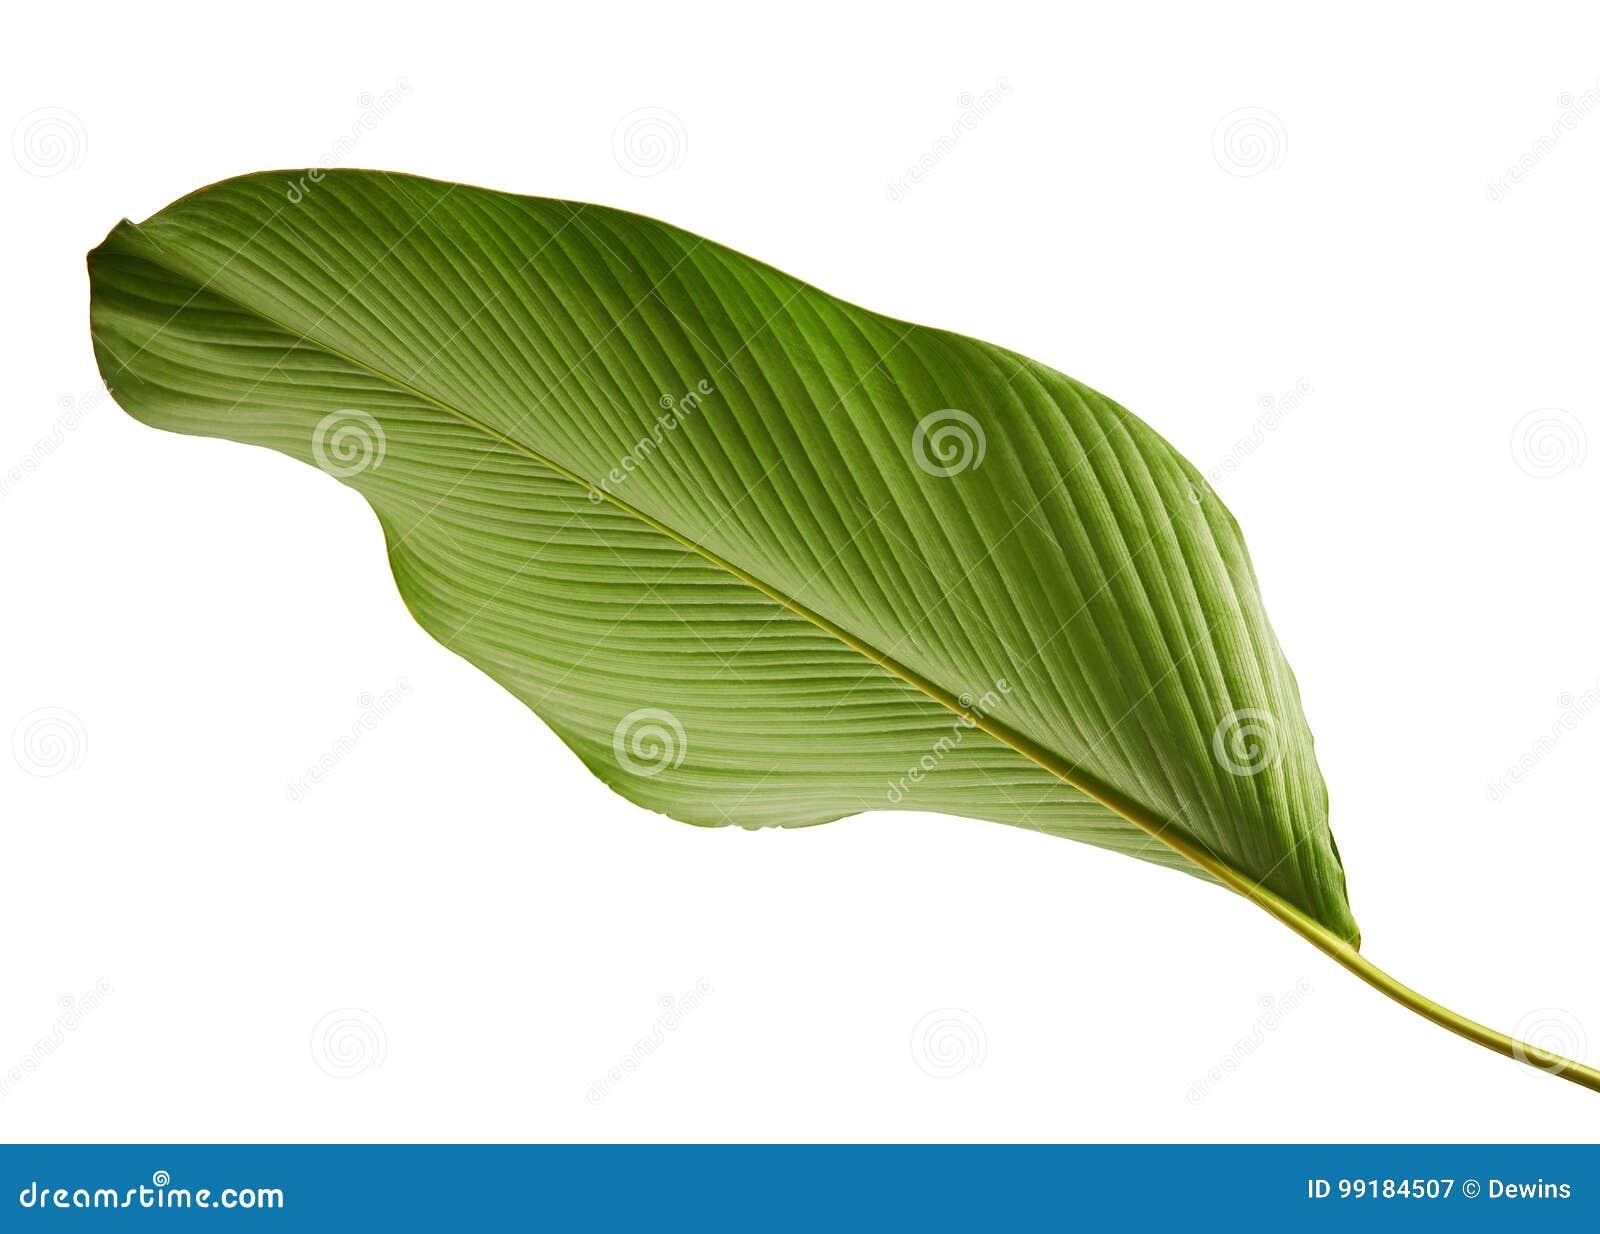 Feuillage de lutea de Calathea, cigare Calathea, cigare cubain, feuille tropicale exotique, feuille de Calathea, d isolement sur